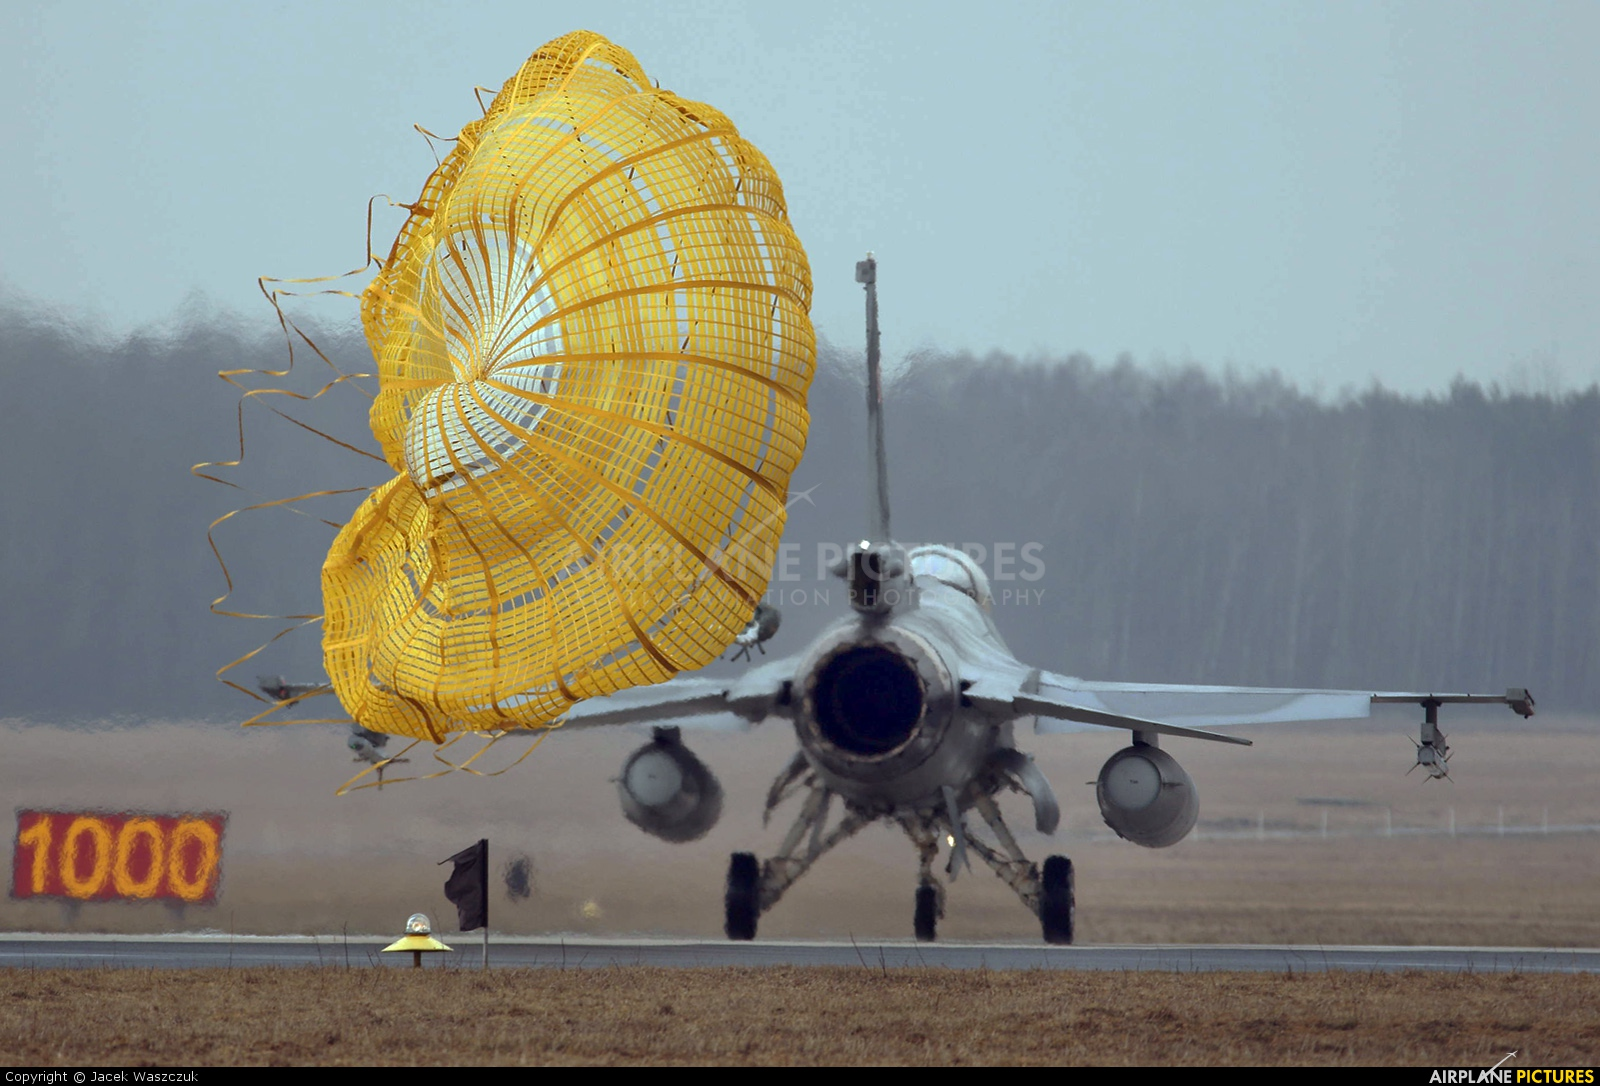 Poland - Air Force 4068 aircraft at Łask AB